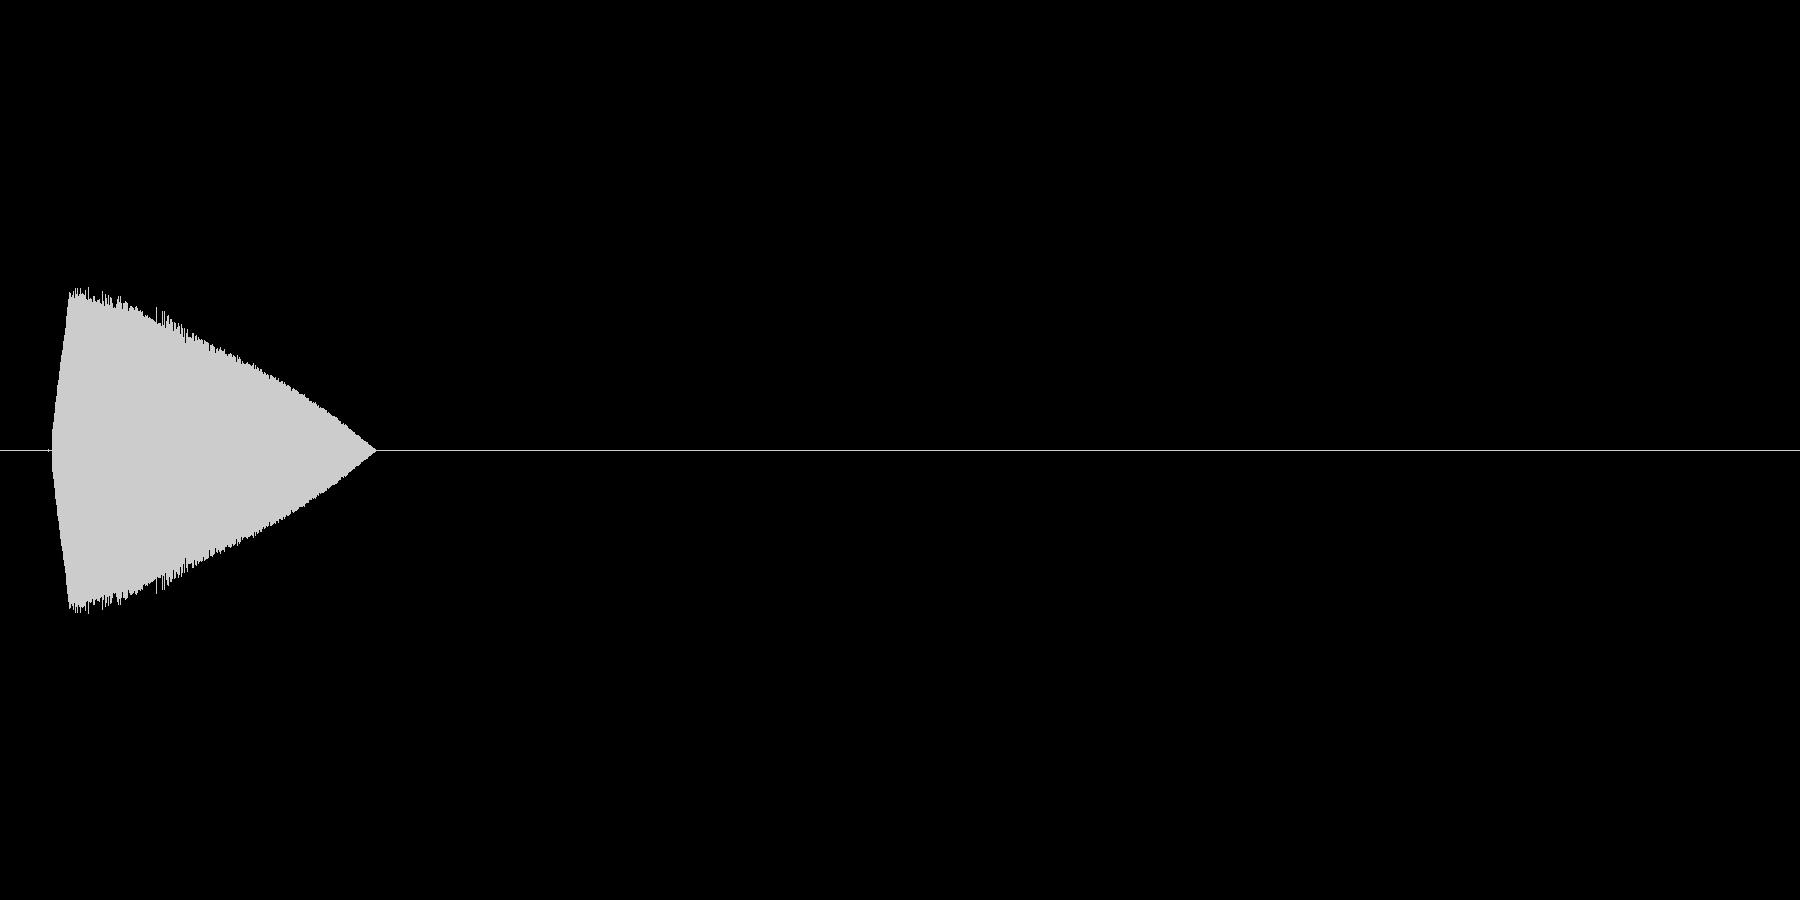 8bit_選択音 ポヨン高音の未再生の波形